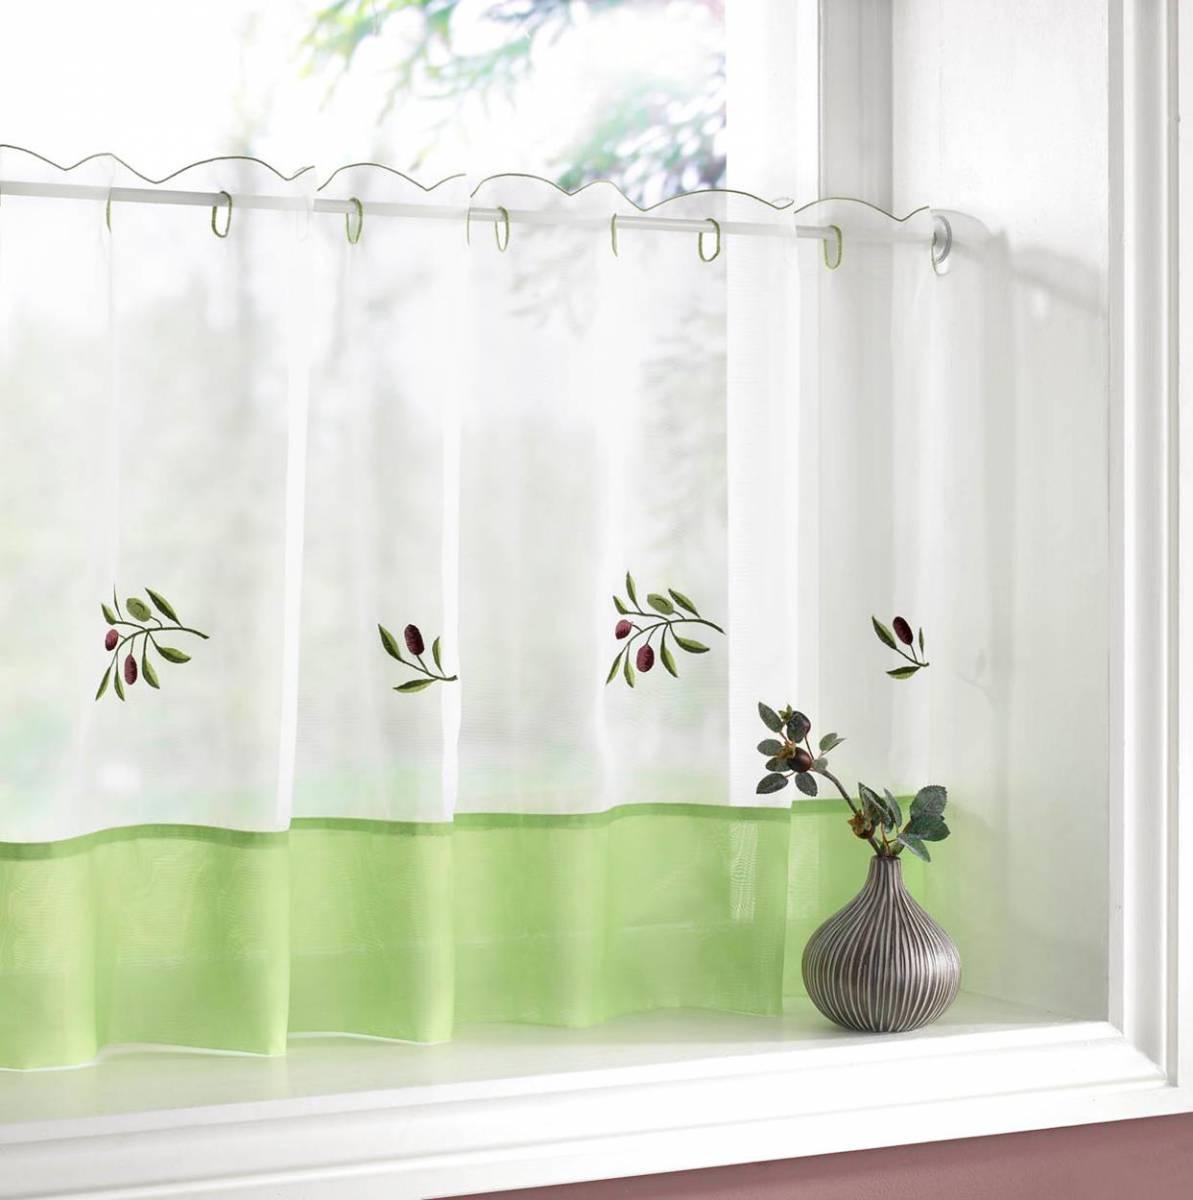 olives cafe net width 60 net curtain 2 curtains. Black Bedroom Furniture Sets. Home Design Ideas